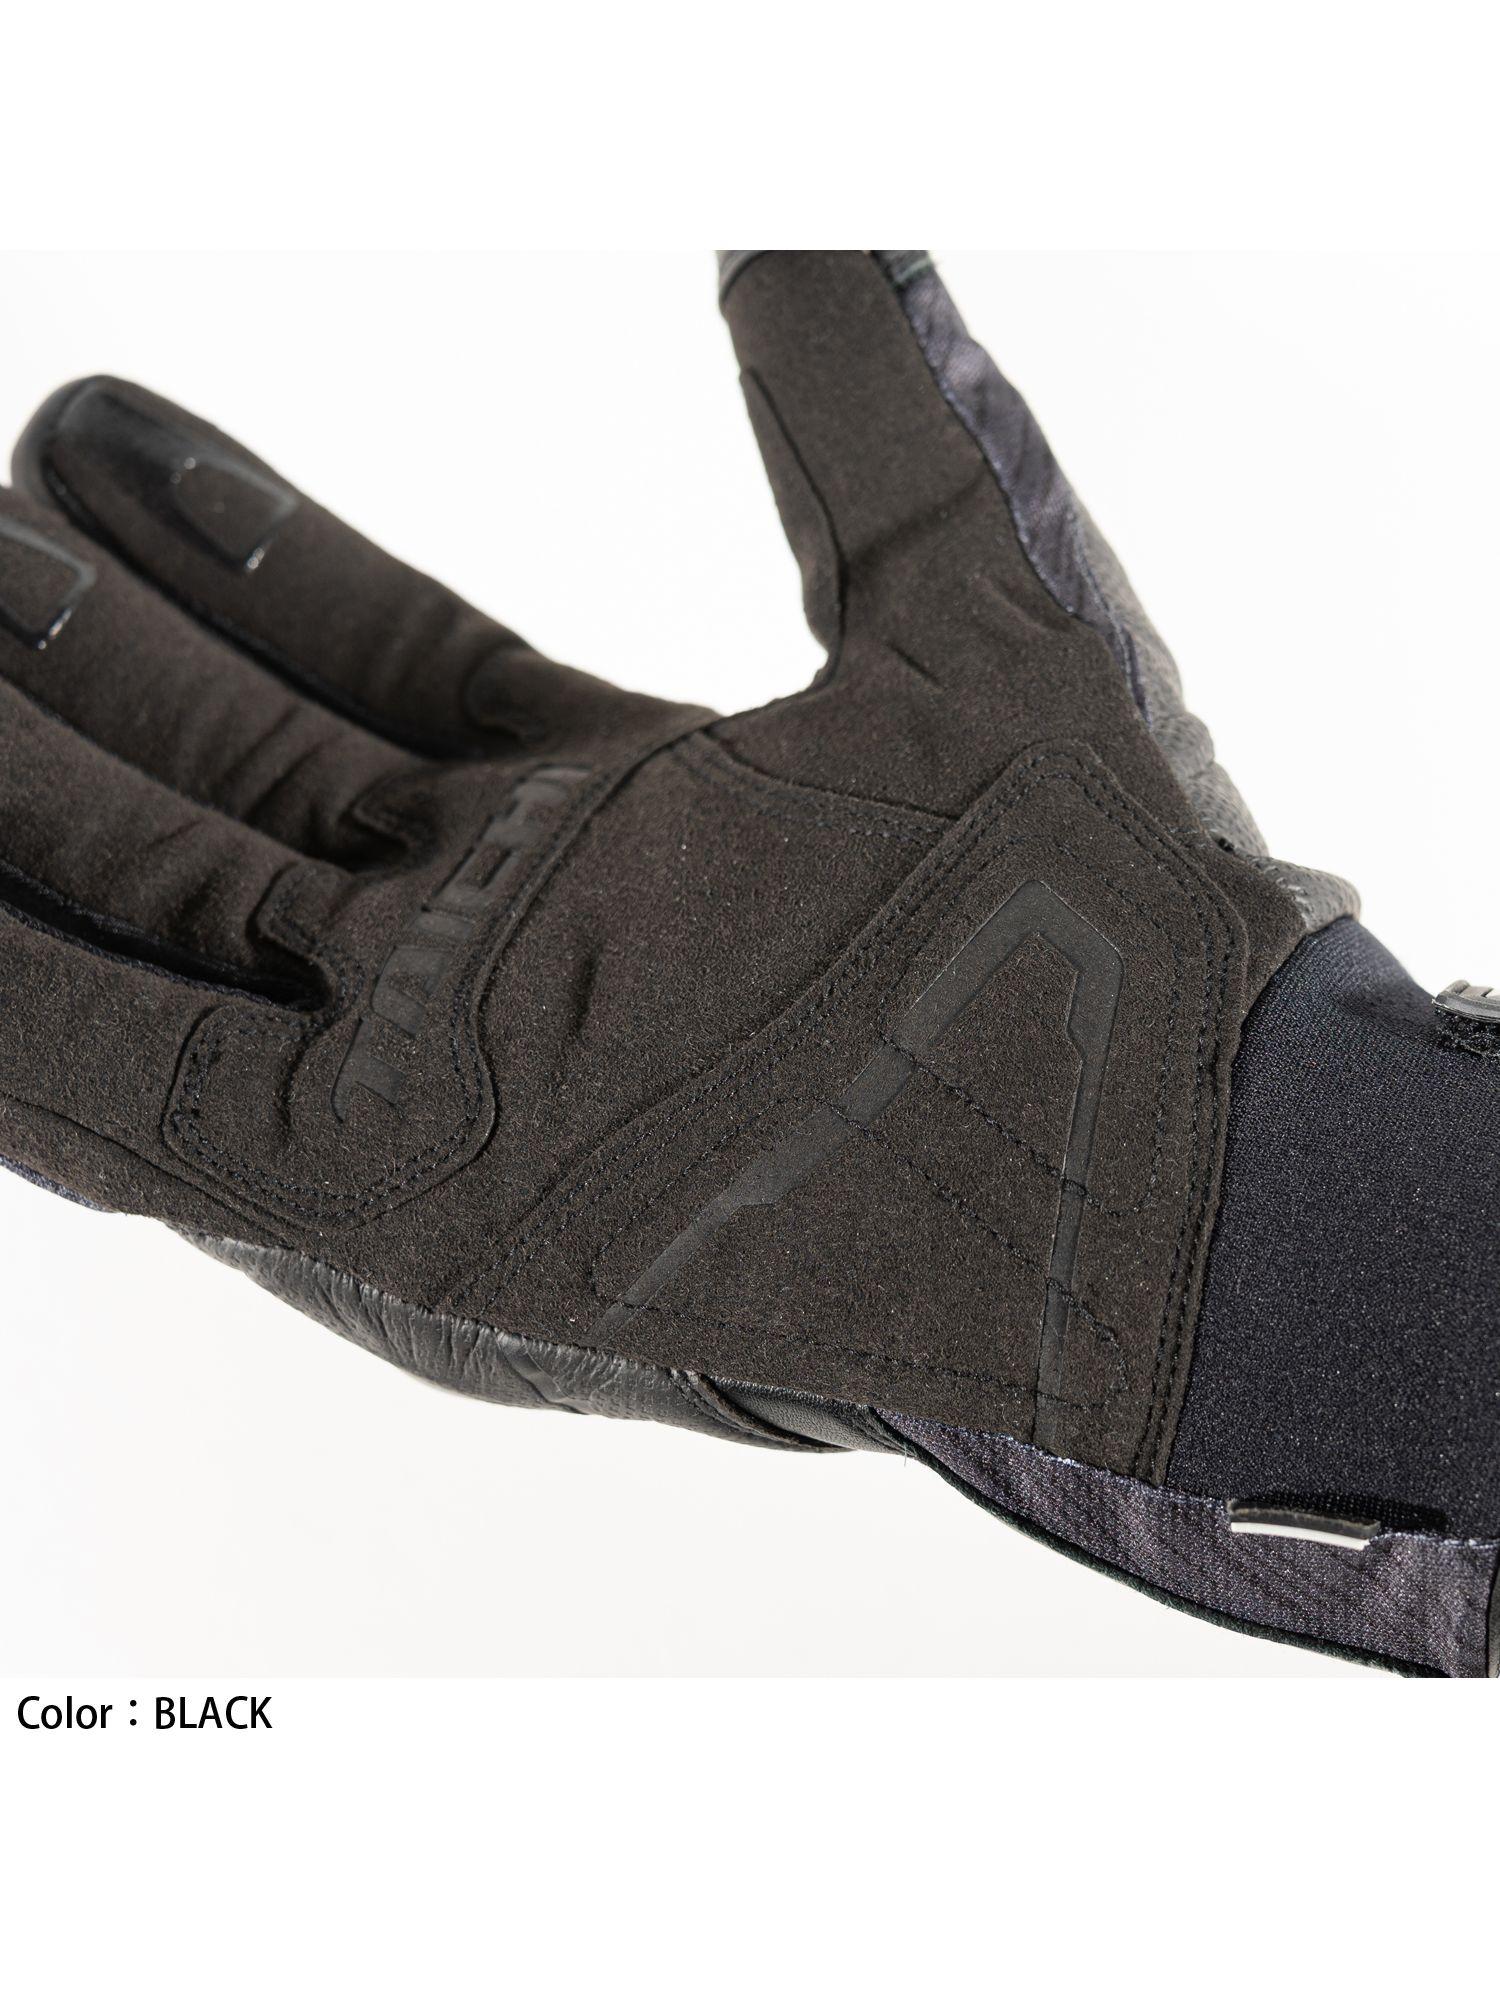 RST630 | MOTO URBAN WINTER GLOVE[6colors]